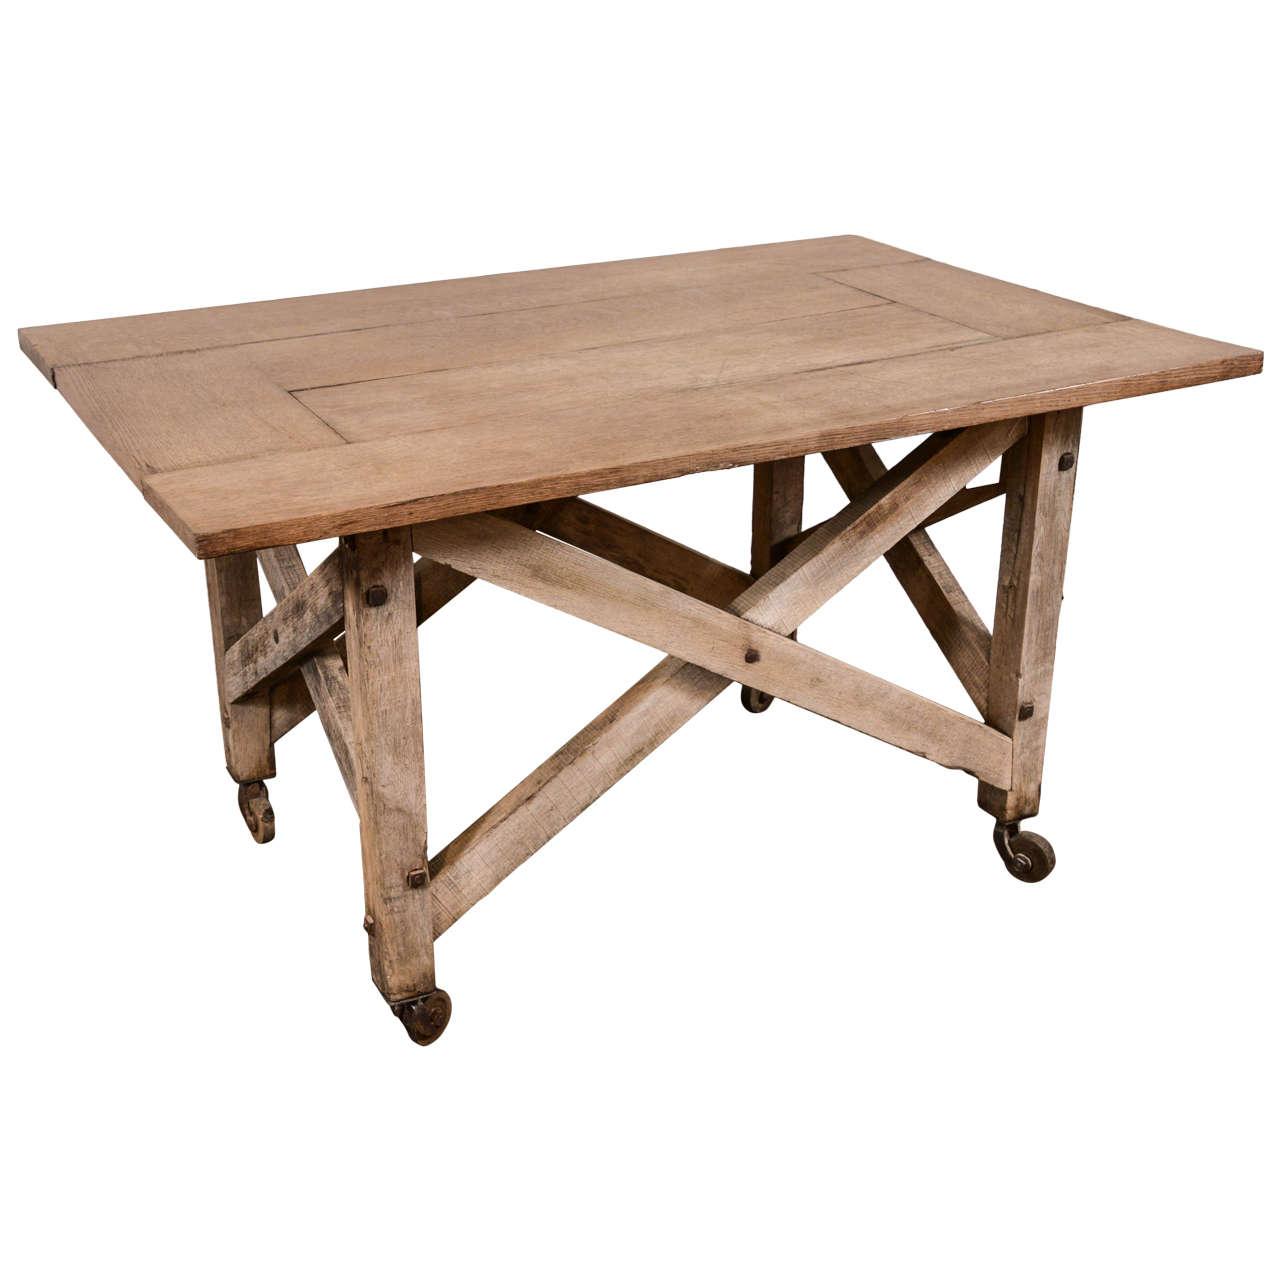 french work table for sale at 1stdibs. Black Bedroom Furniture Sets. Home Design Ideas